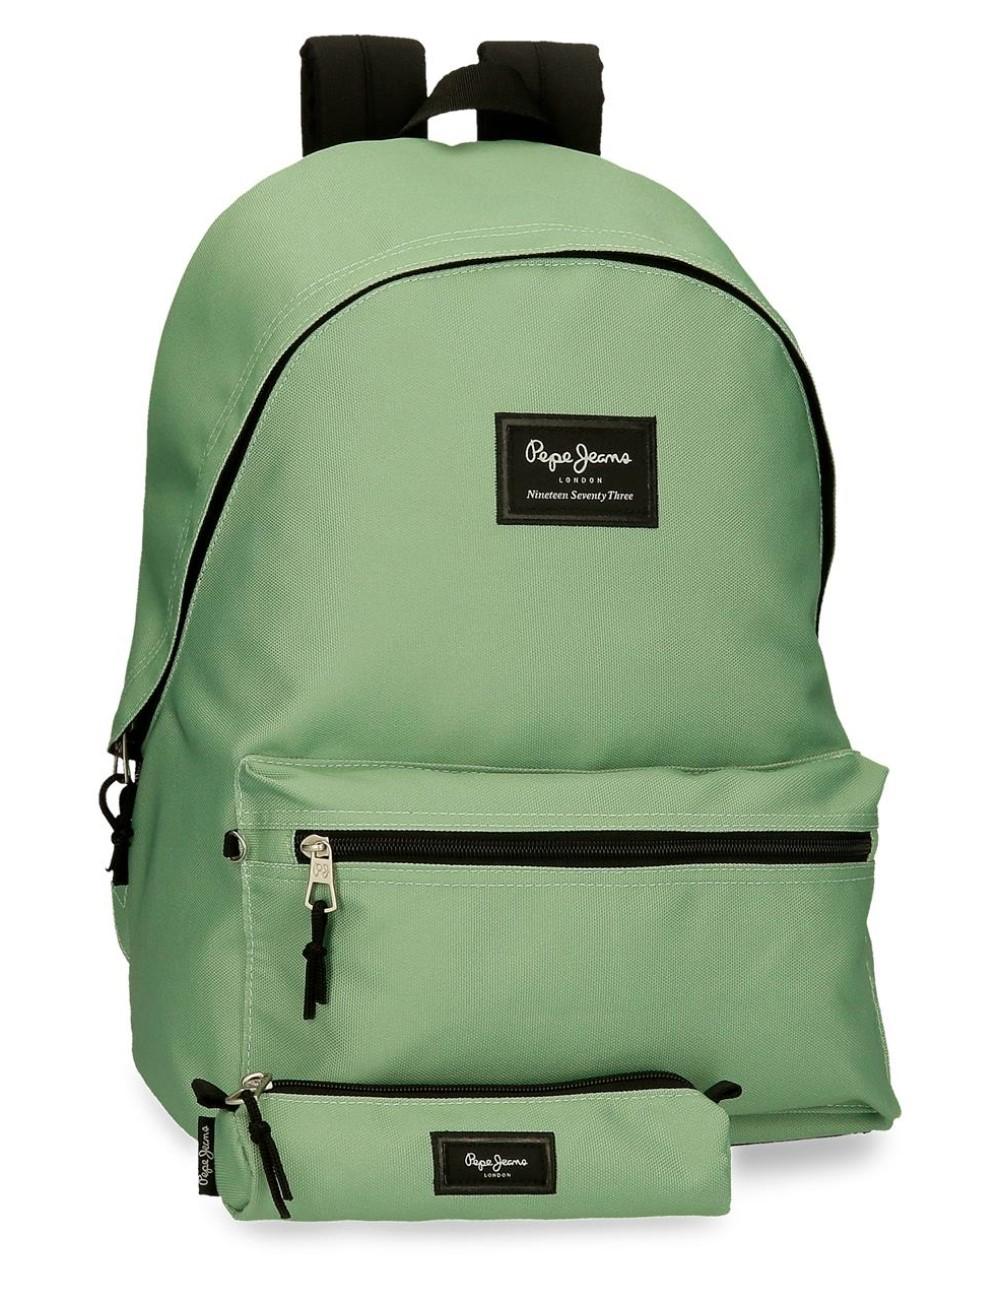 Mochila Portaordenador + Portatodo Pepe Jeans Colorful Verde Claro 6329229